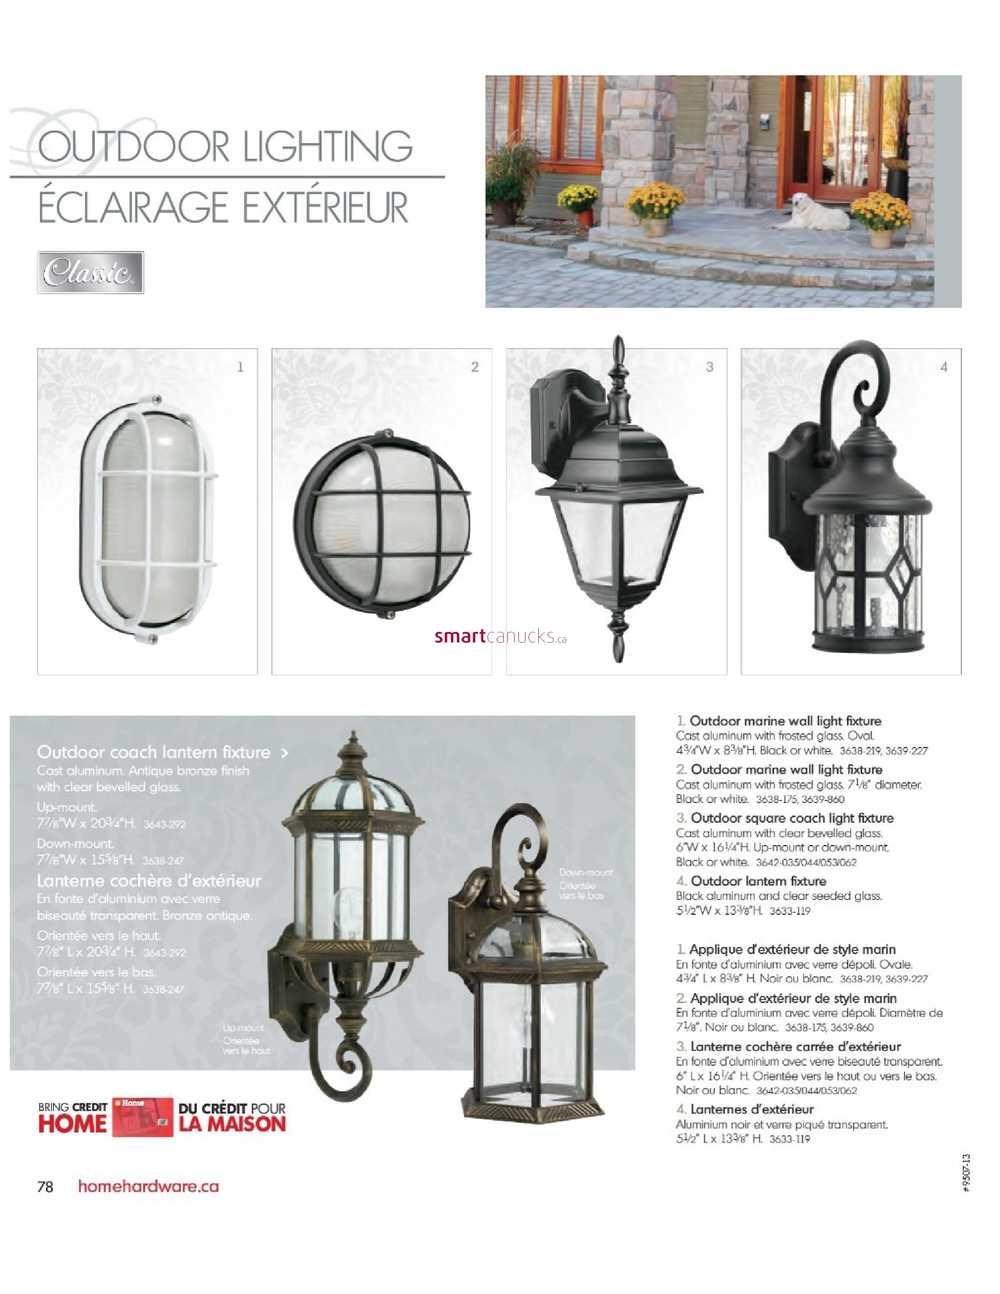 Home hardware lightingelectrical catalog home hardware lightingelectrical catalog arubaitofo Images